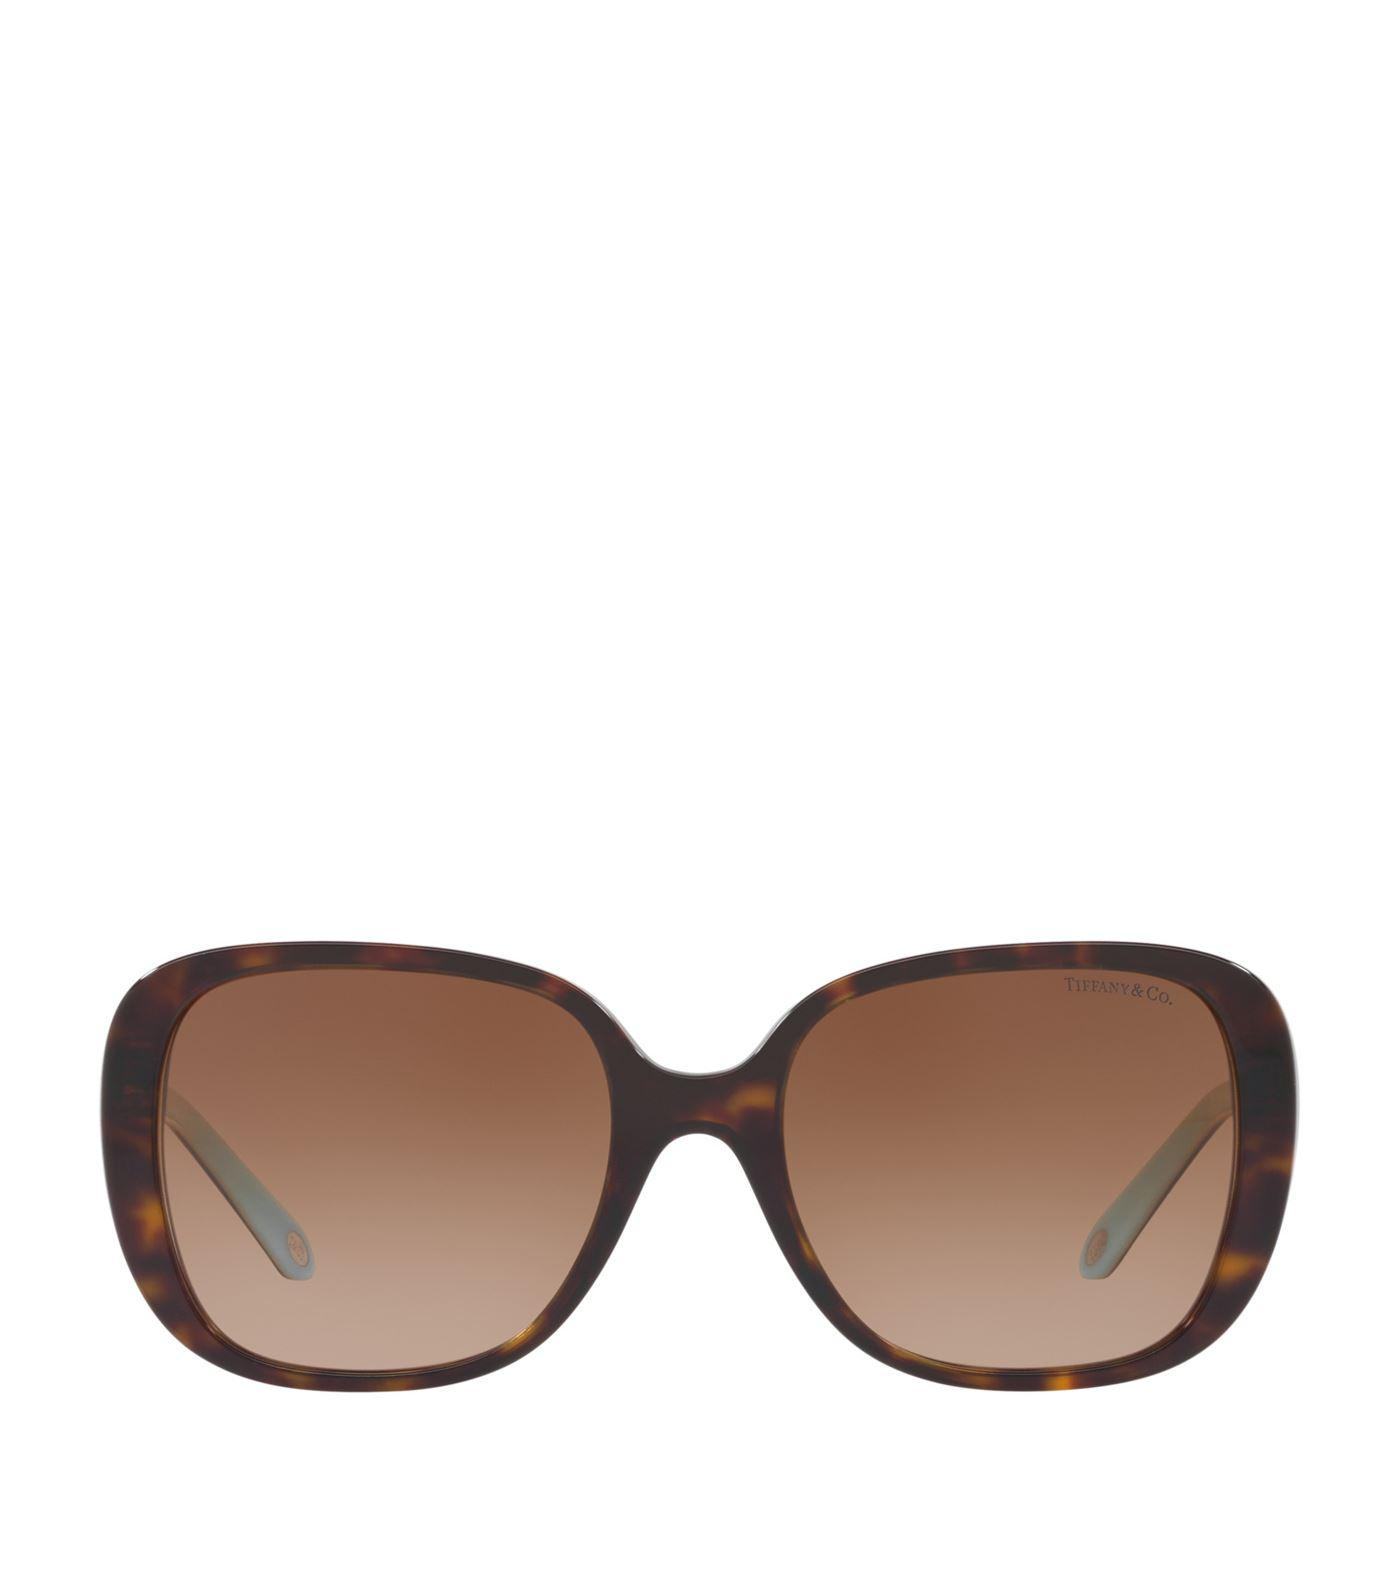 4598cb00c5a Tiffany   Co 54Mm Gradient Sunglasses - Dark Havana In Brown